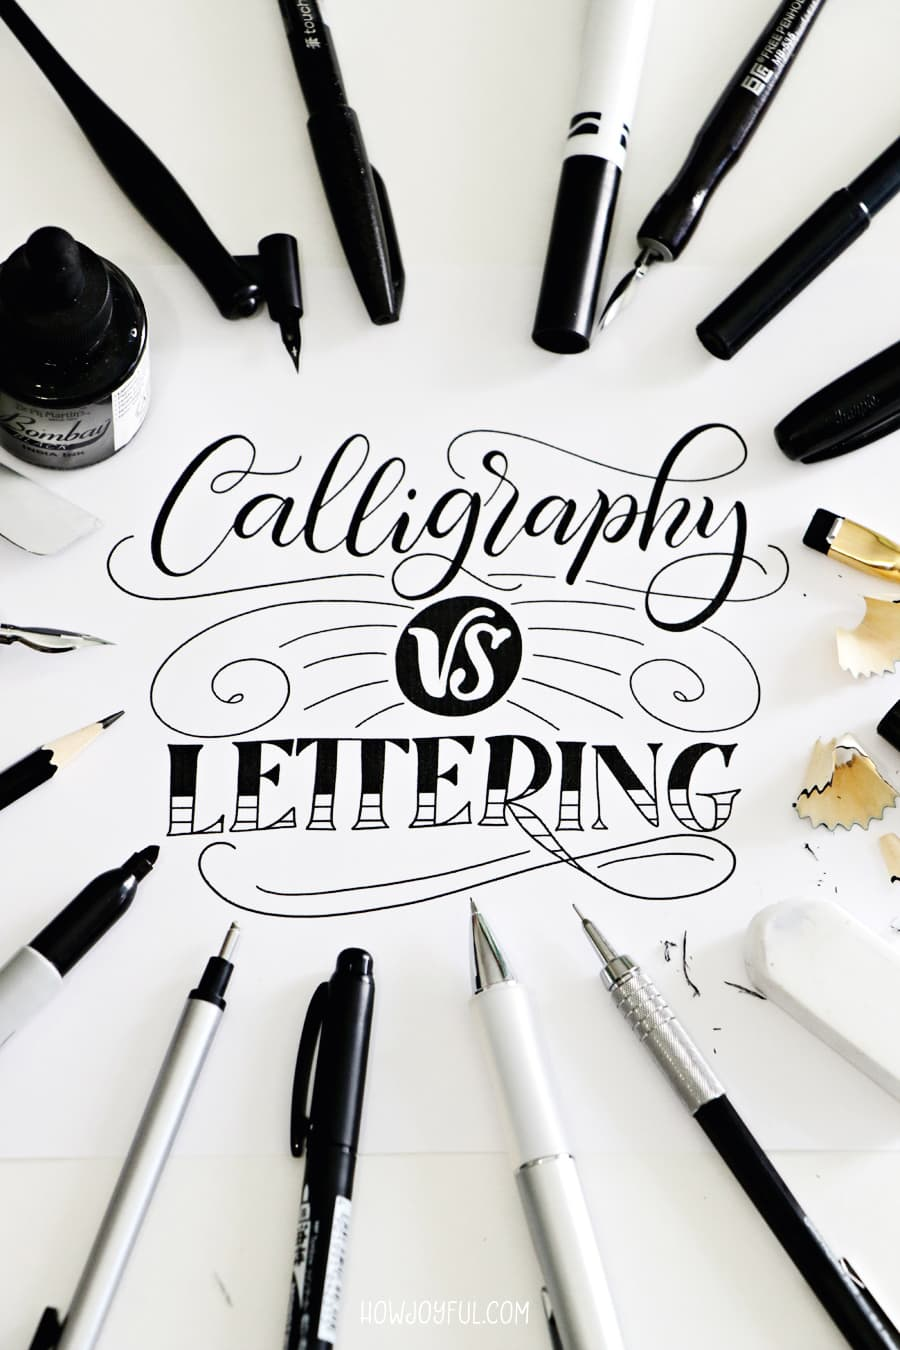 Calligraphy vs lettering